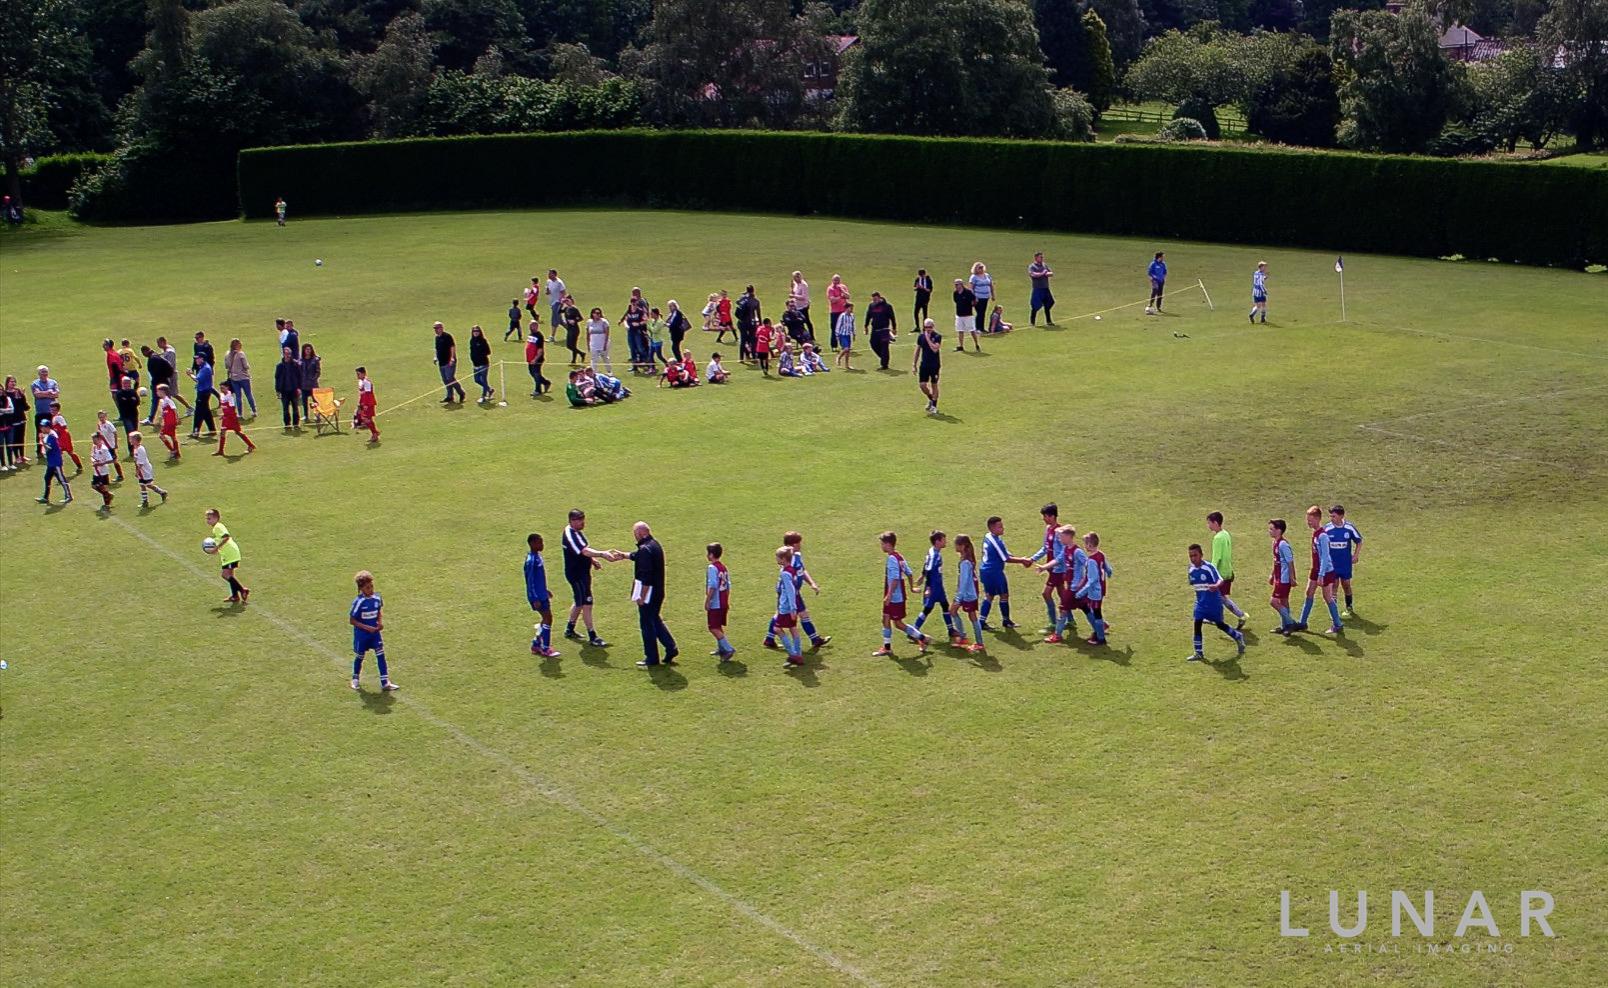 drone footage of soccer tournament northwest hands.jpg